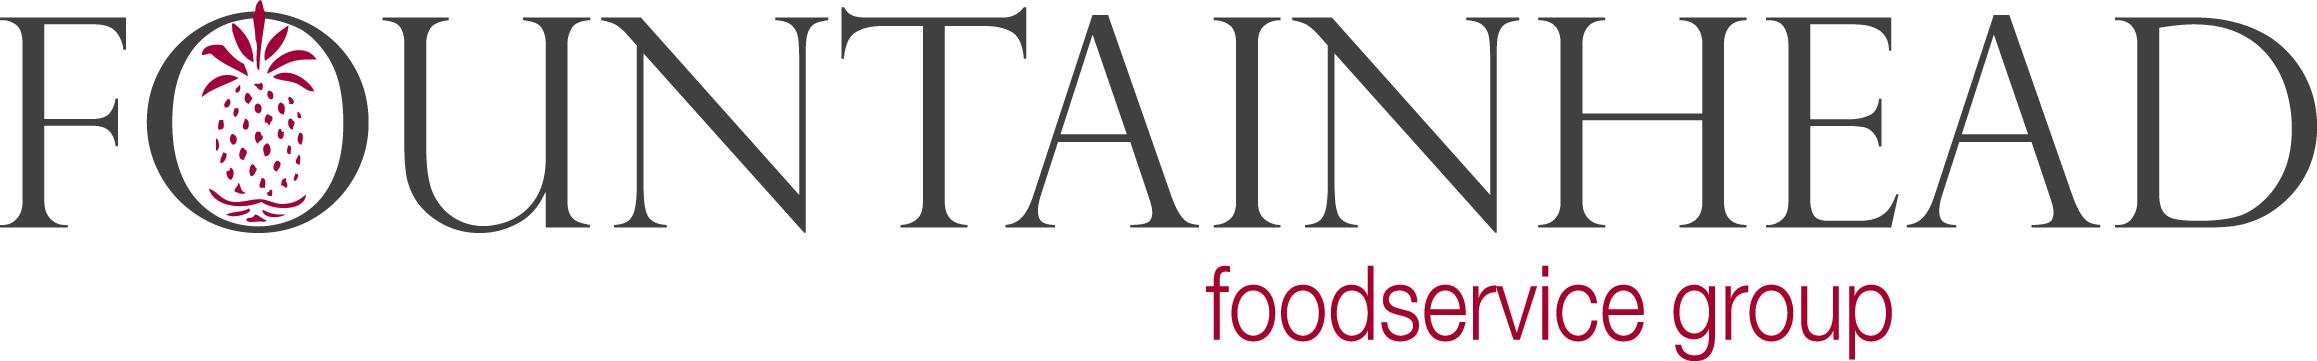 Fountainhead Foodservice Group